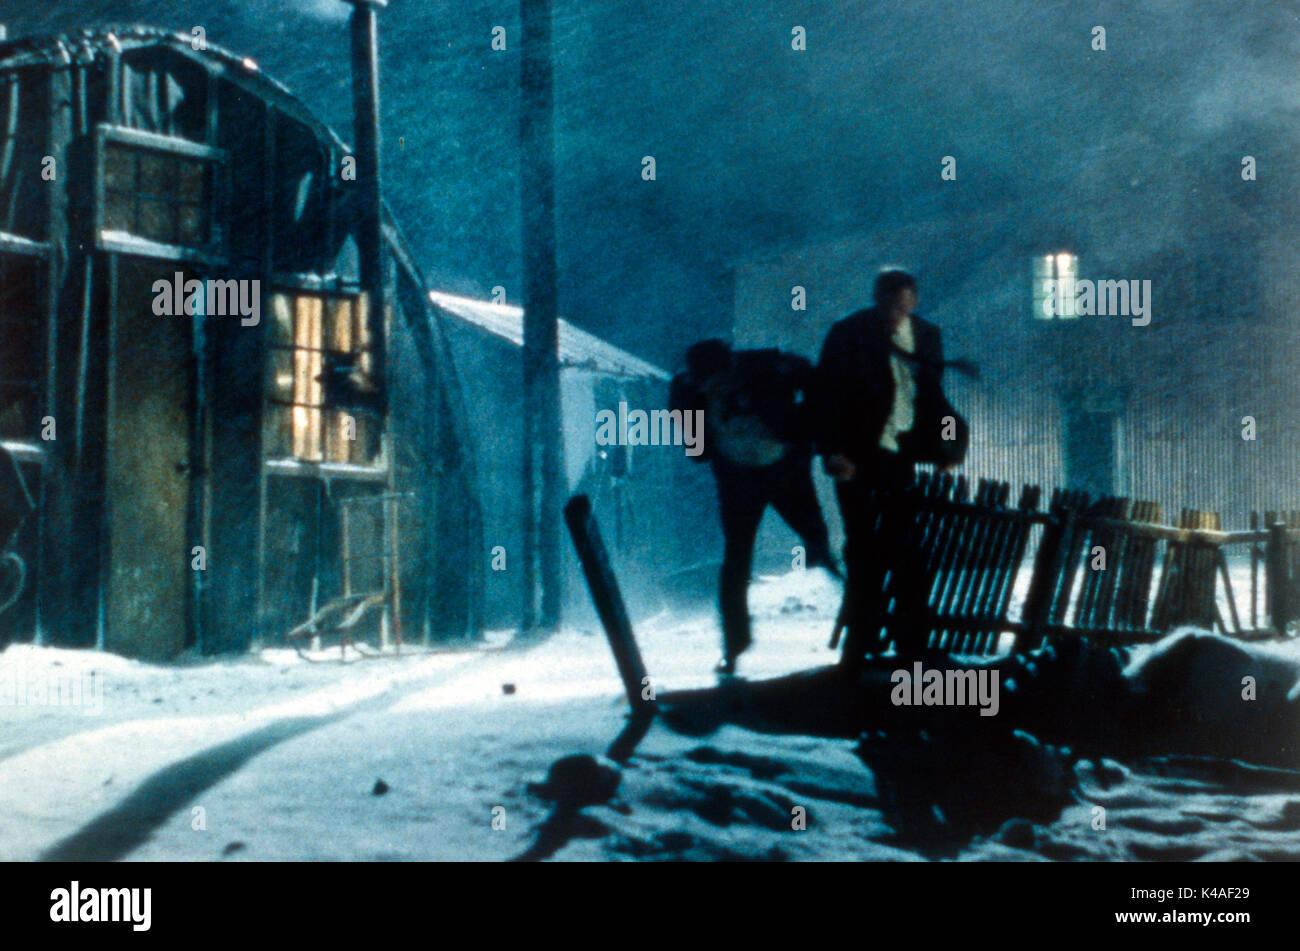 Djöflaeyjan, aka: Die Teufelsinsel, Island/Norwegen/Deutschland/Dänemark 1996, Regie: Fridrik Thor Fridriksson, Szenenfoto Stockbild